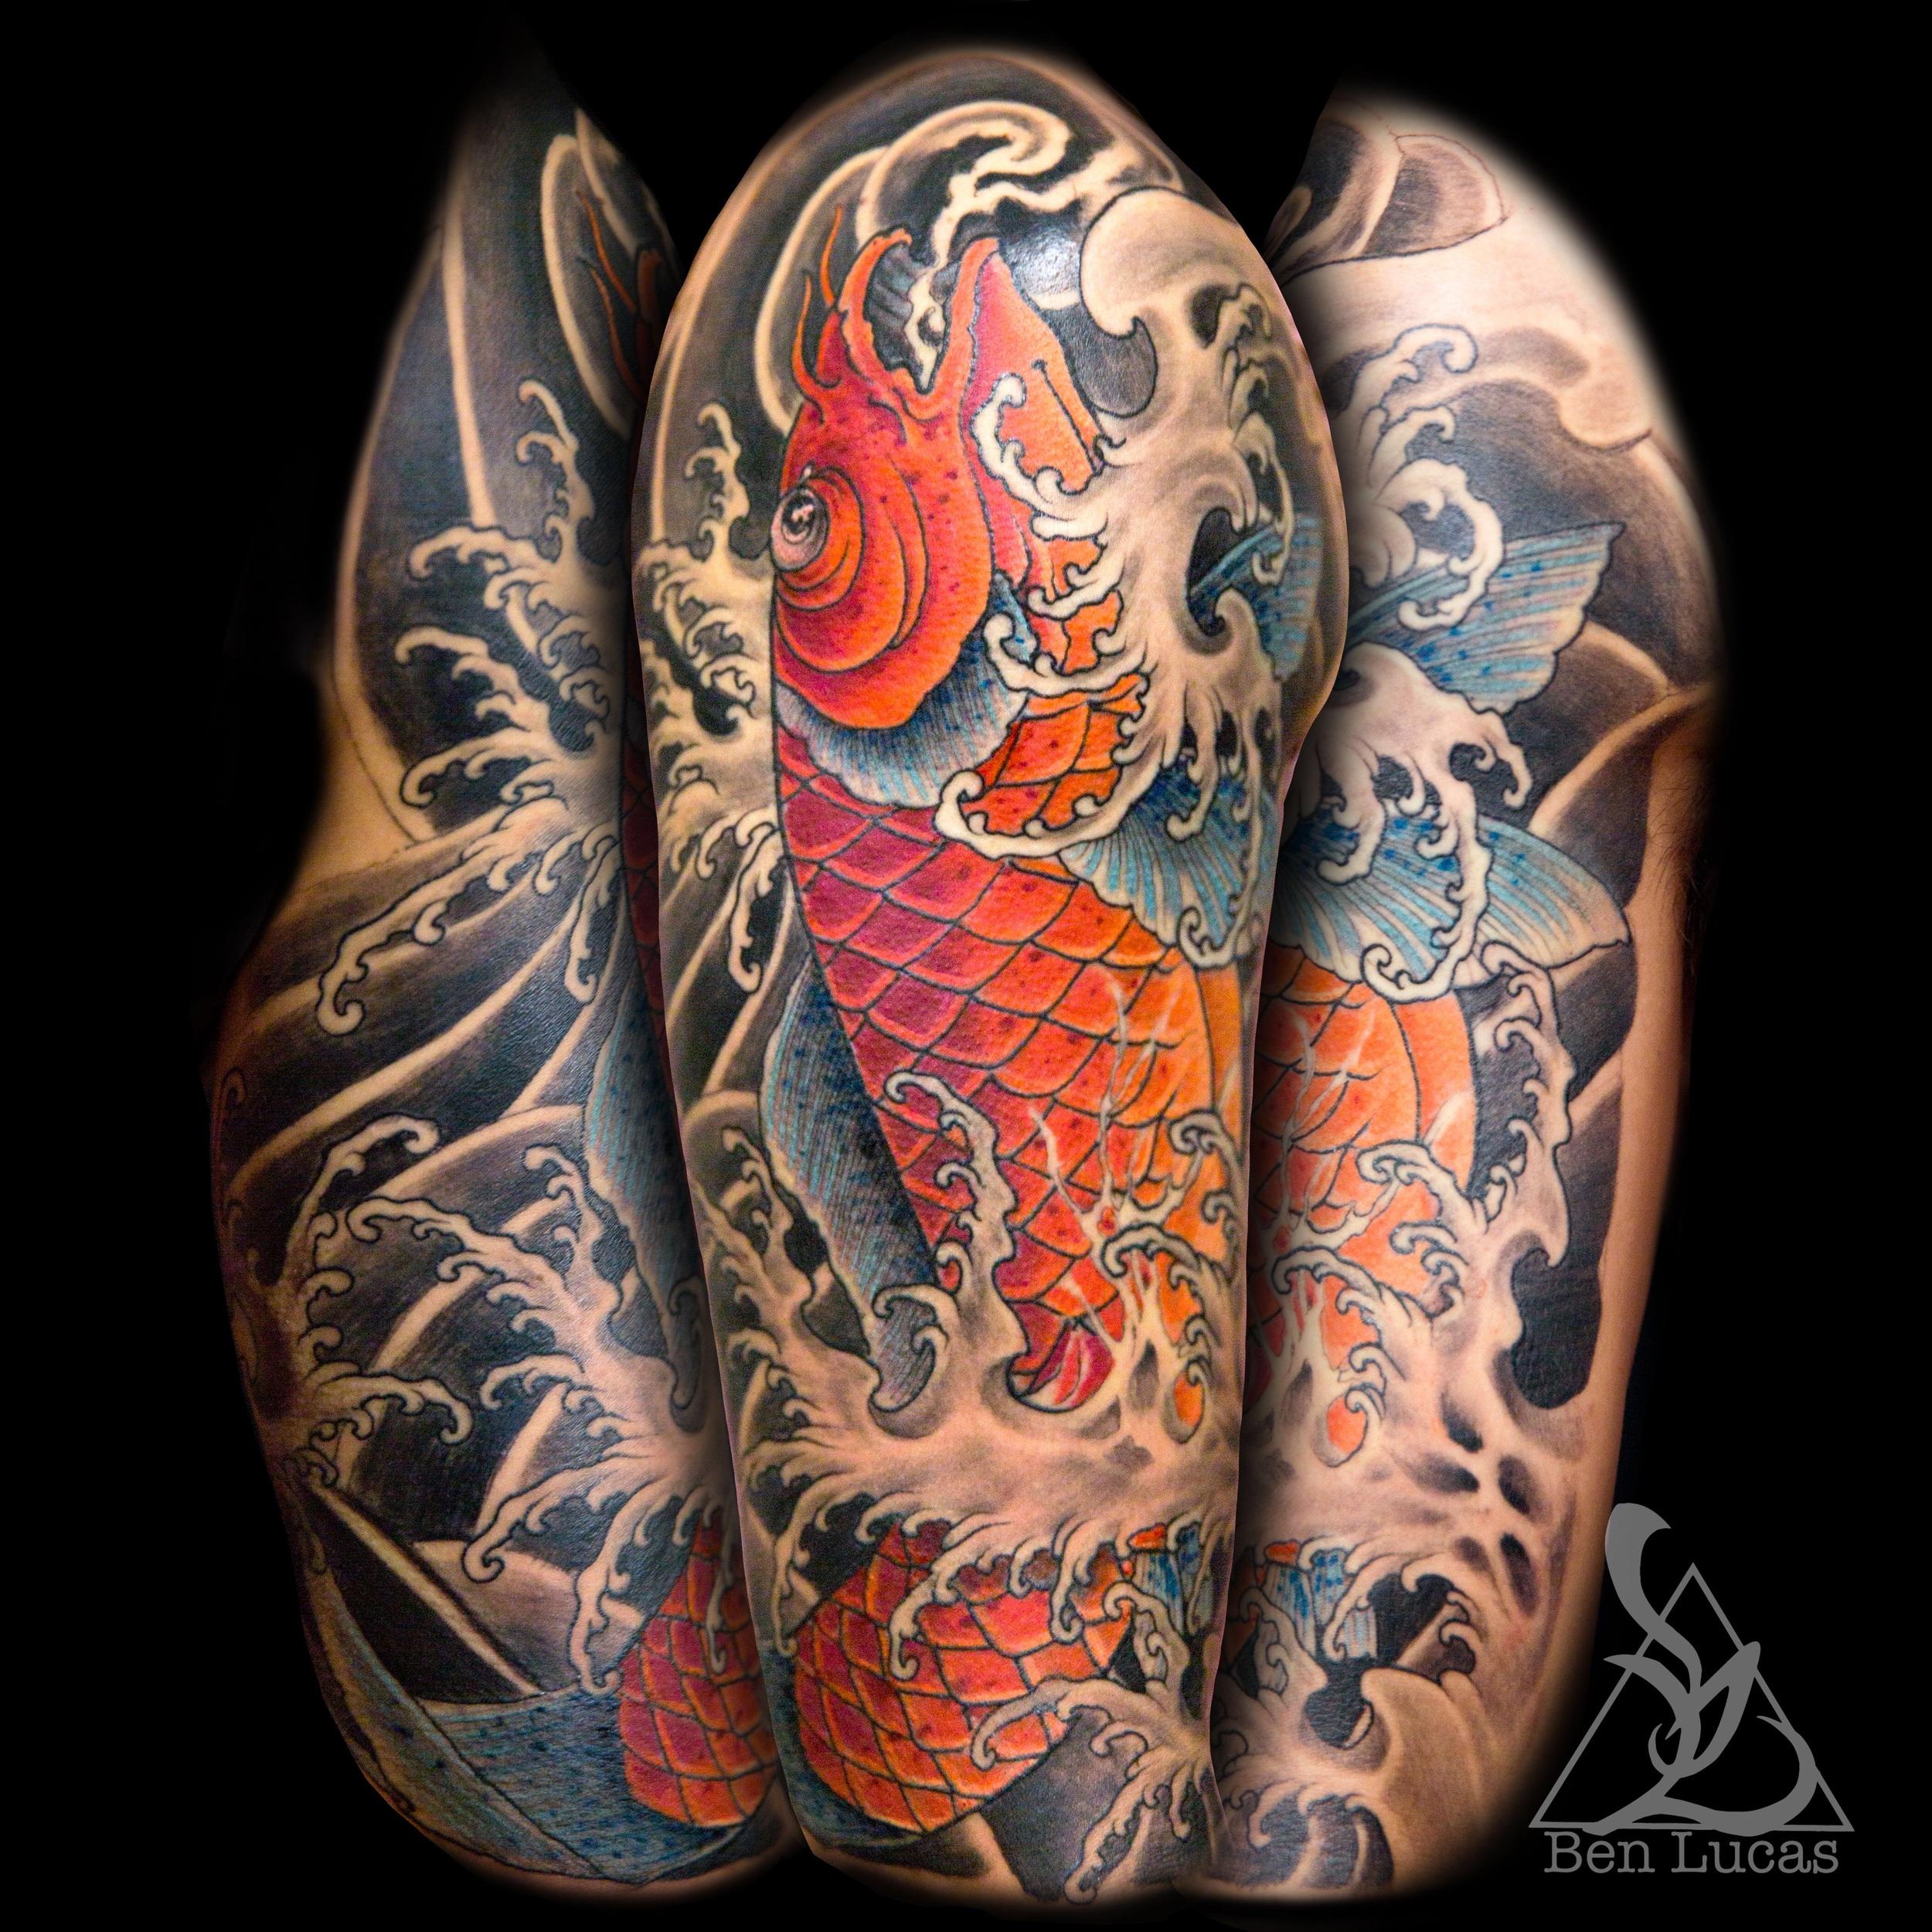 Here's a jumping koi fish half sleeve tattoo I did on my buddy William. Sat like a champ too!